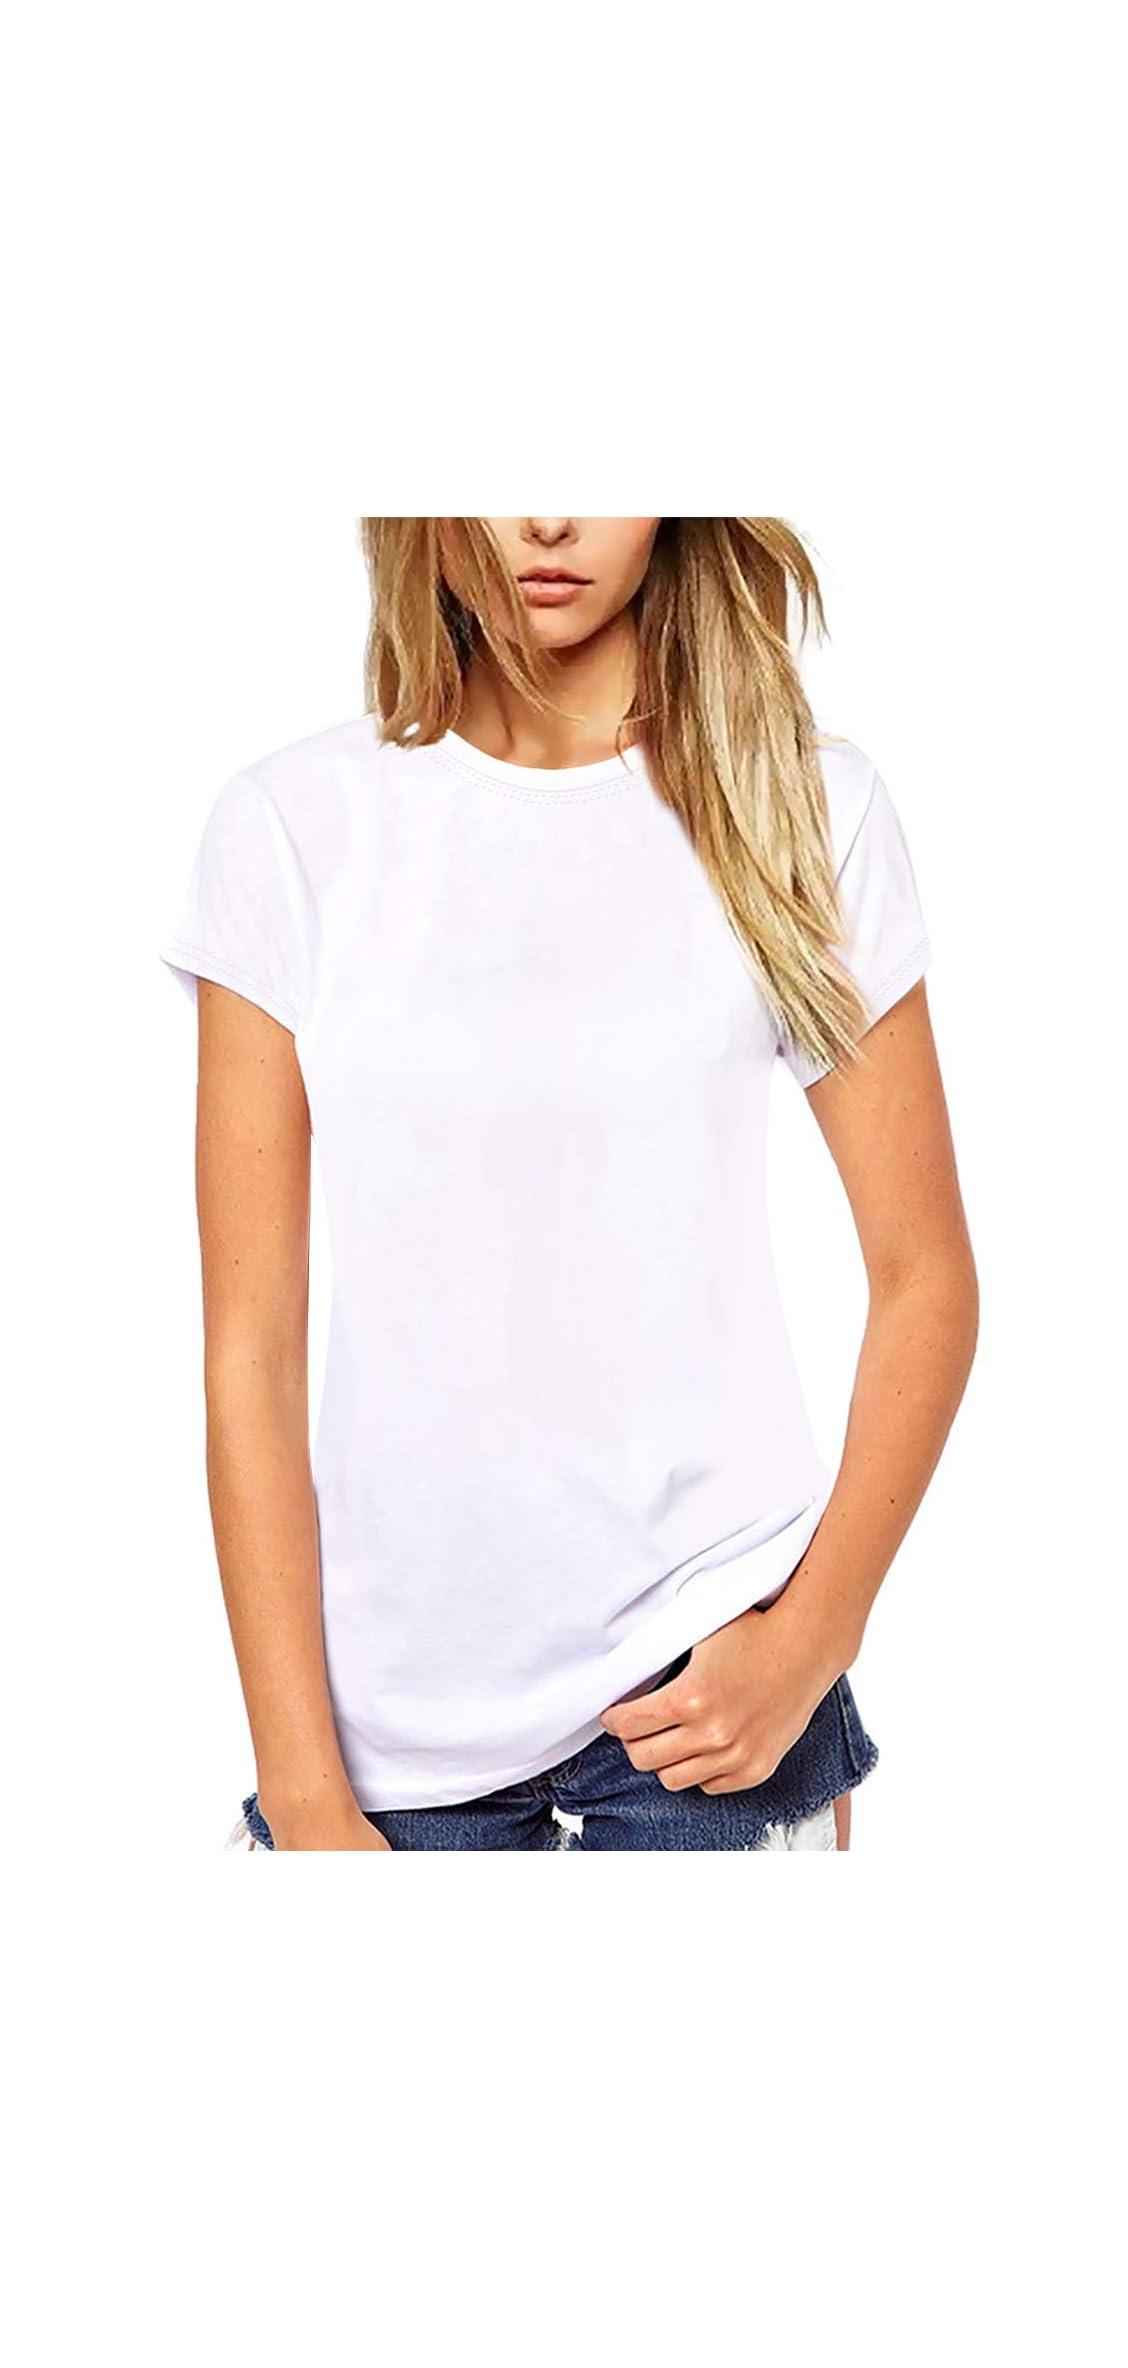 Women T Shirt Cute Crew Neck Tee Casual Blouse